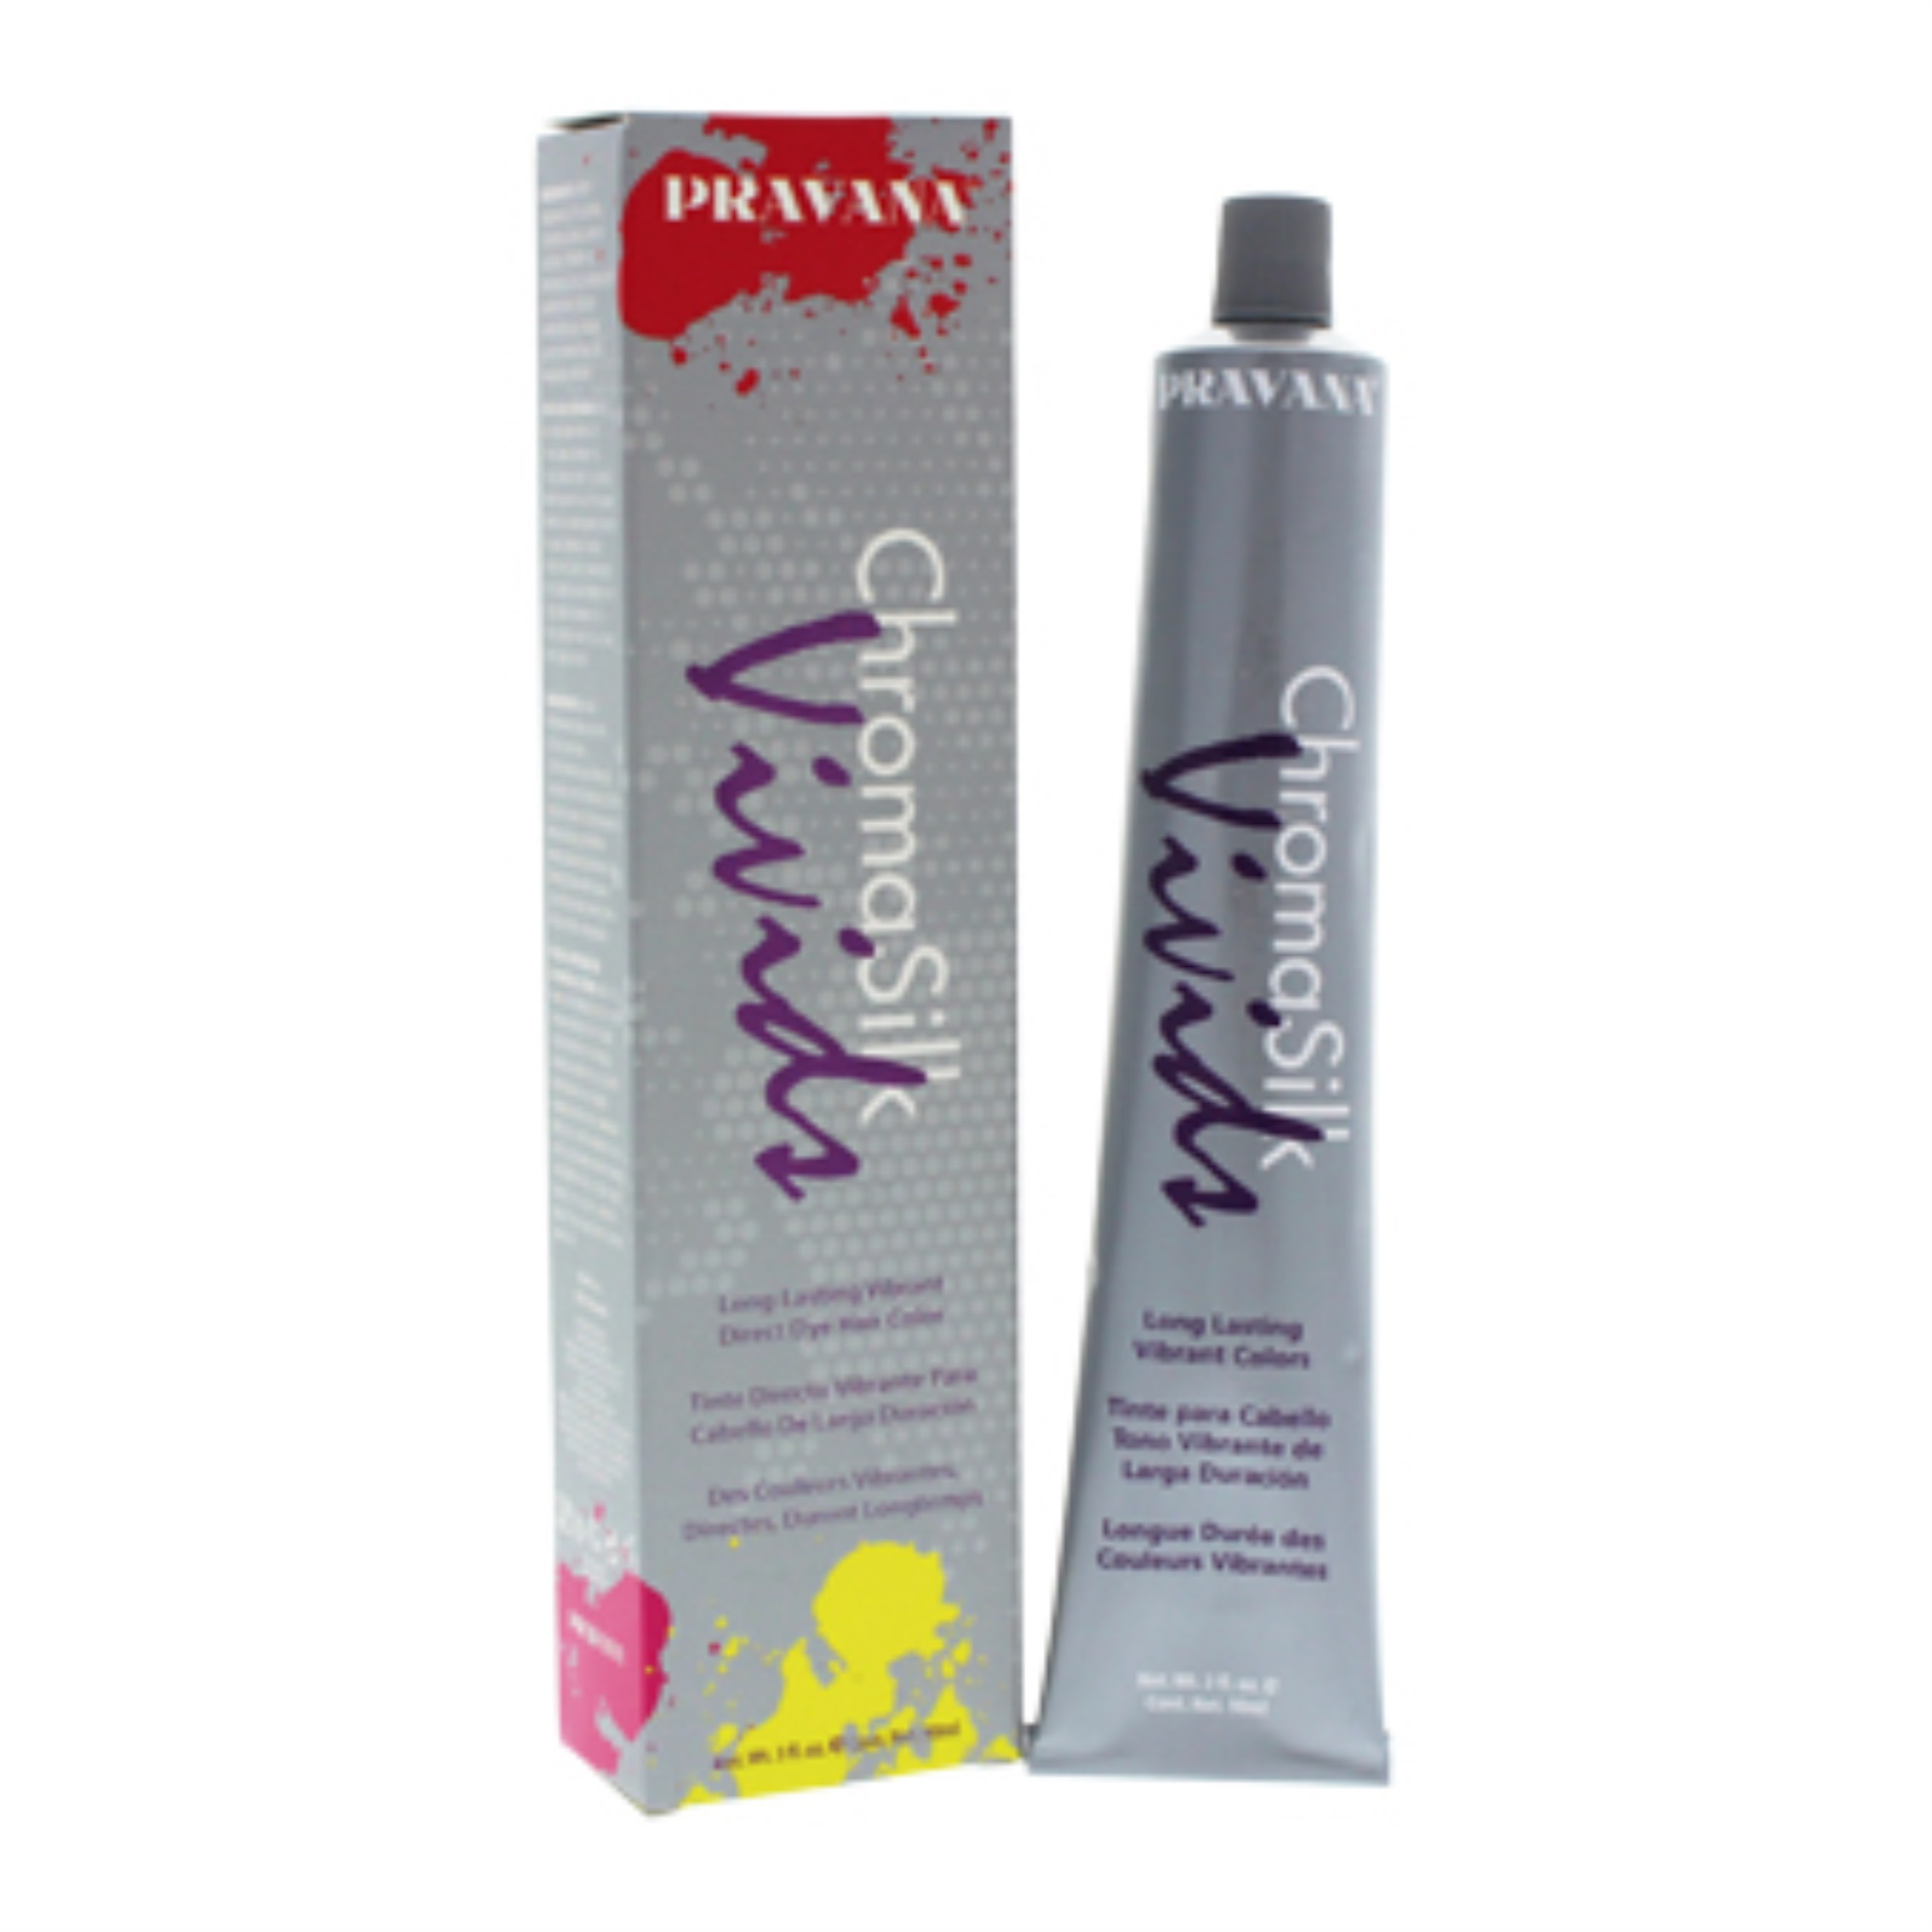 ChromaSilk Vivids Long-Lasting Vibrant Color - Green by Pravana for Unisex - 3 oz Hair Color - image 2 of 3